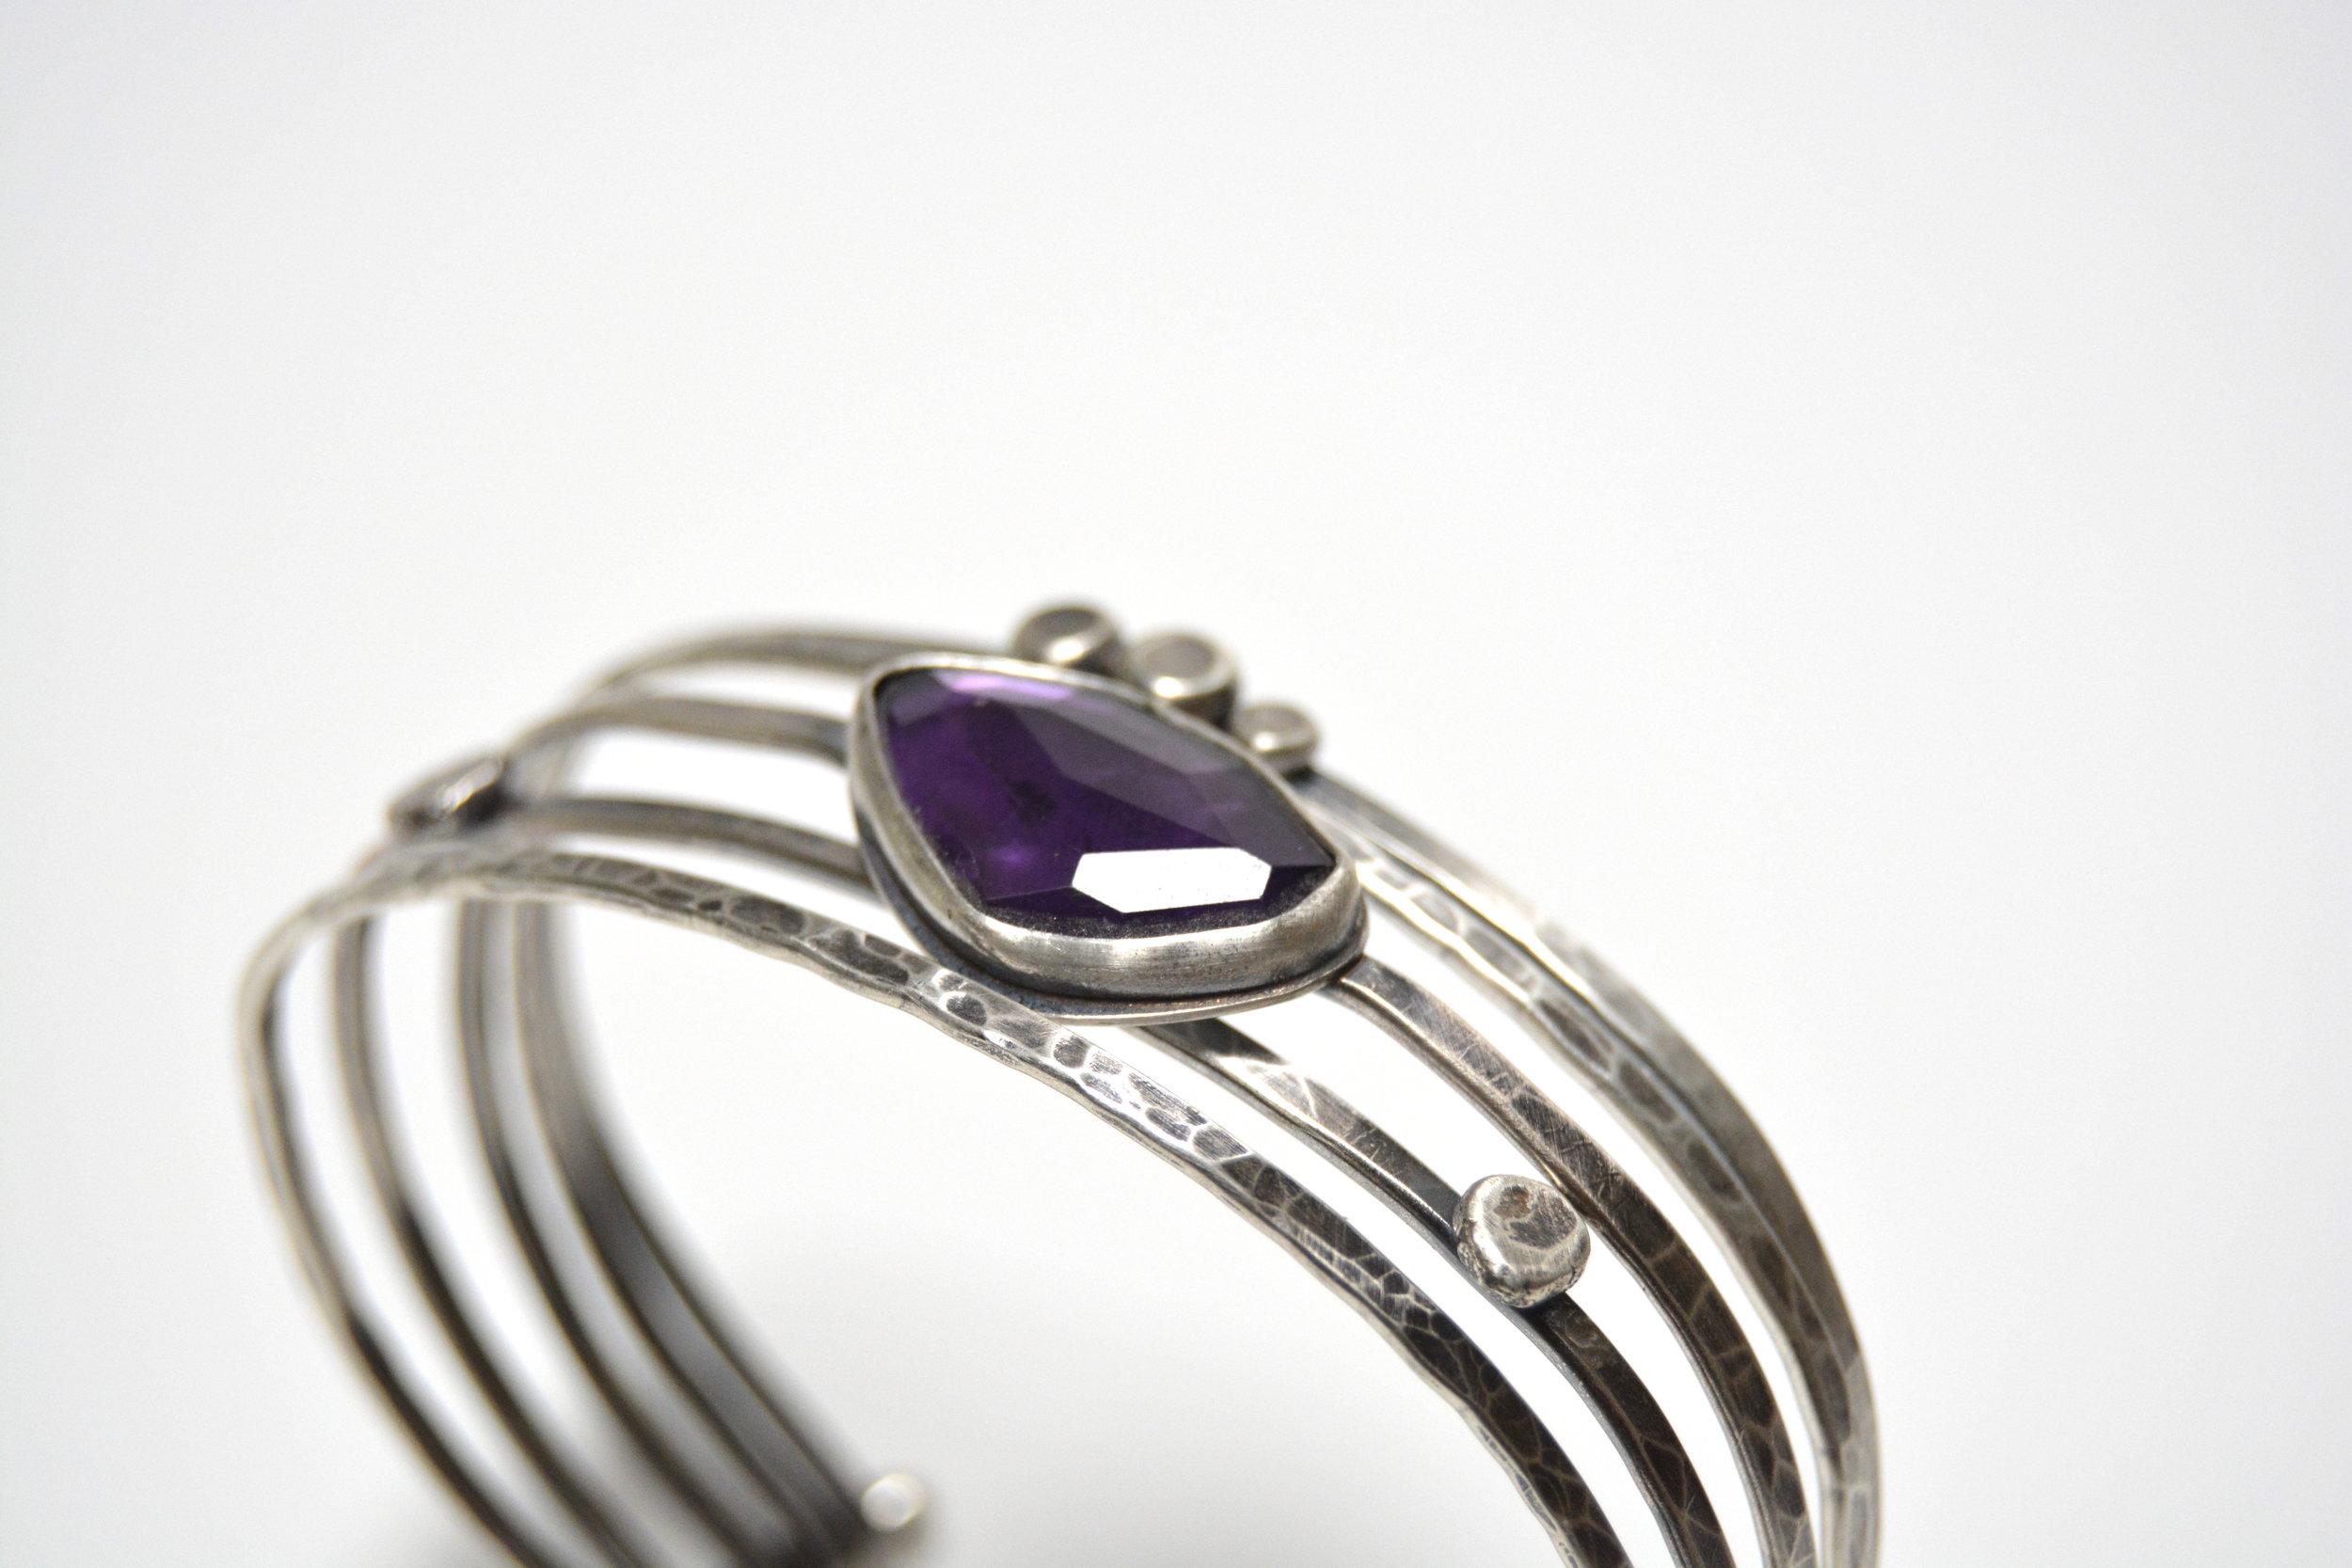 cuffs / bracelets